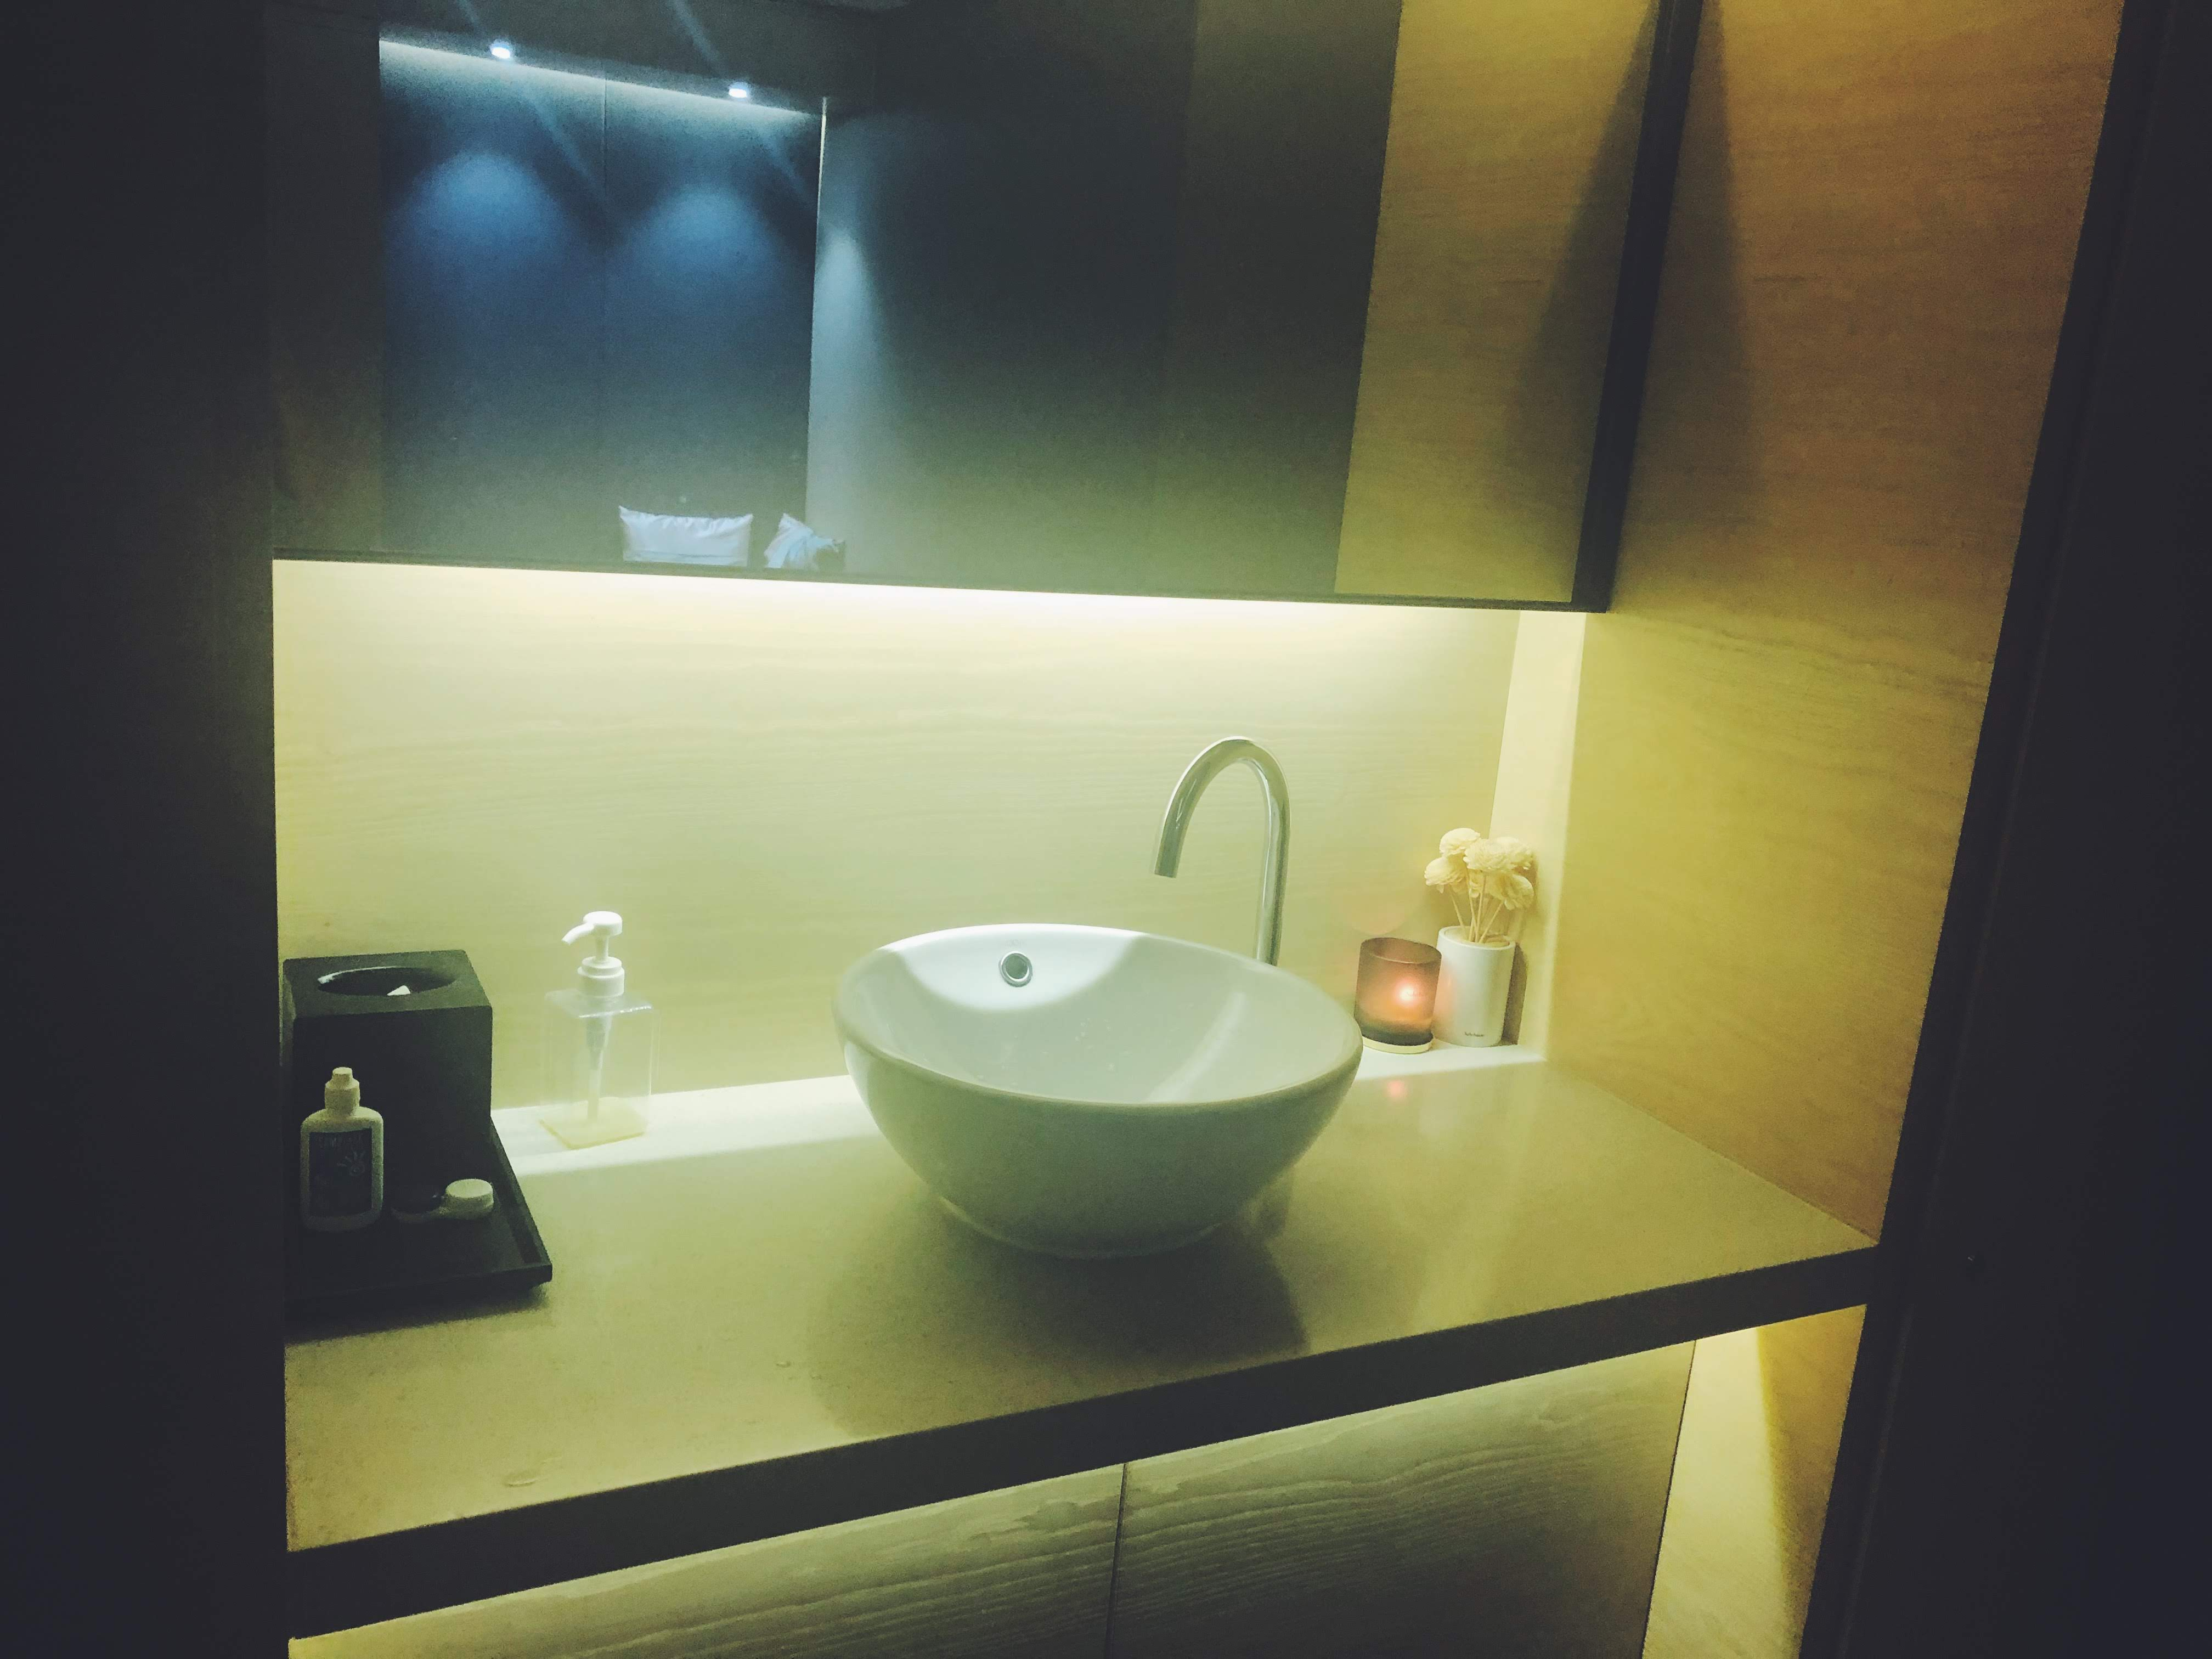 "Malaysia_BeautyTrip_Sink_029"""""